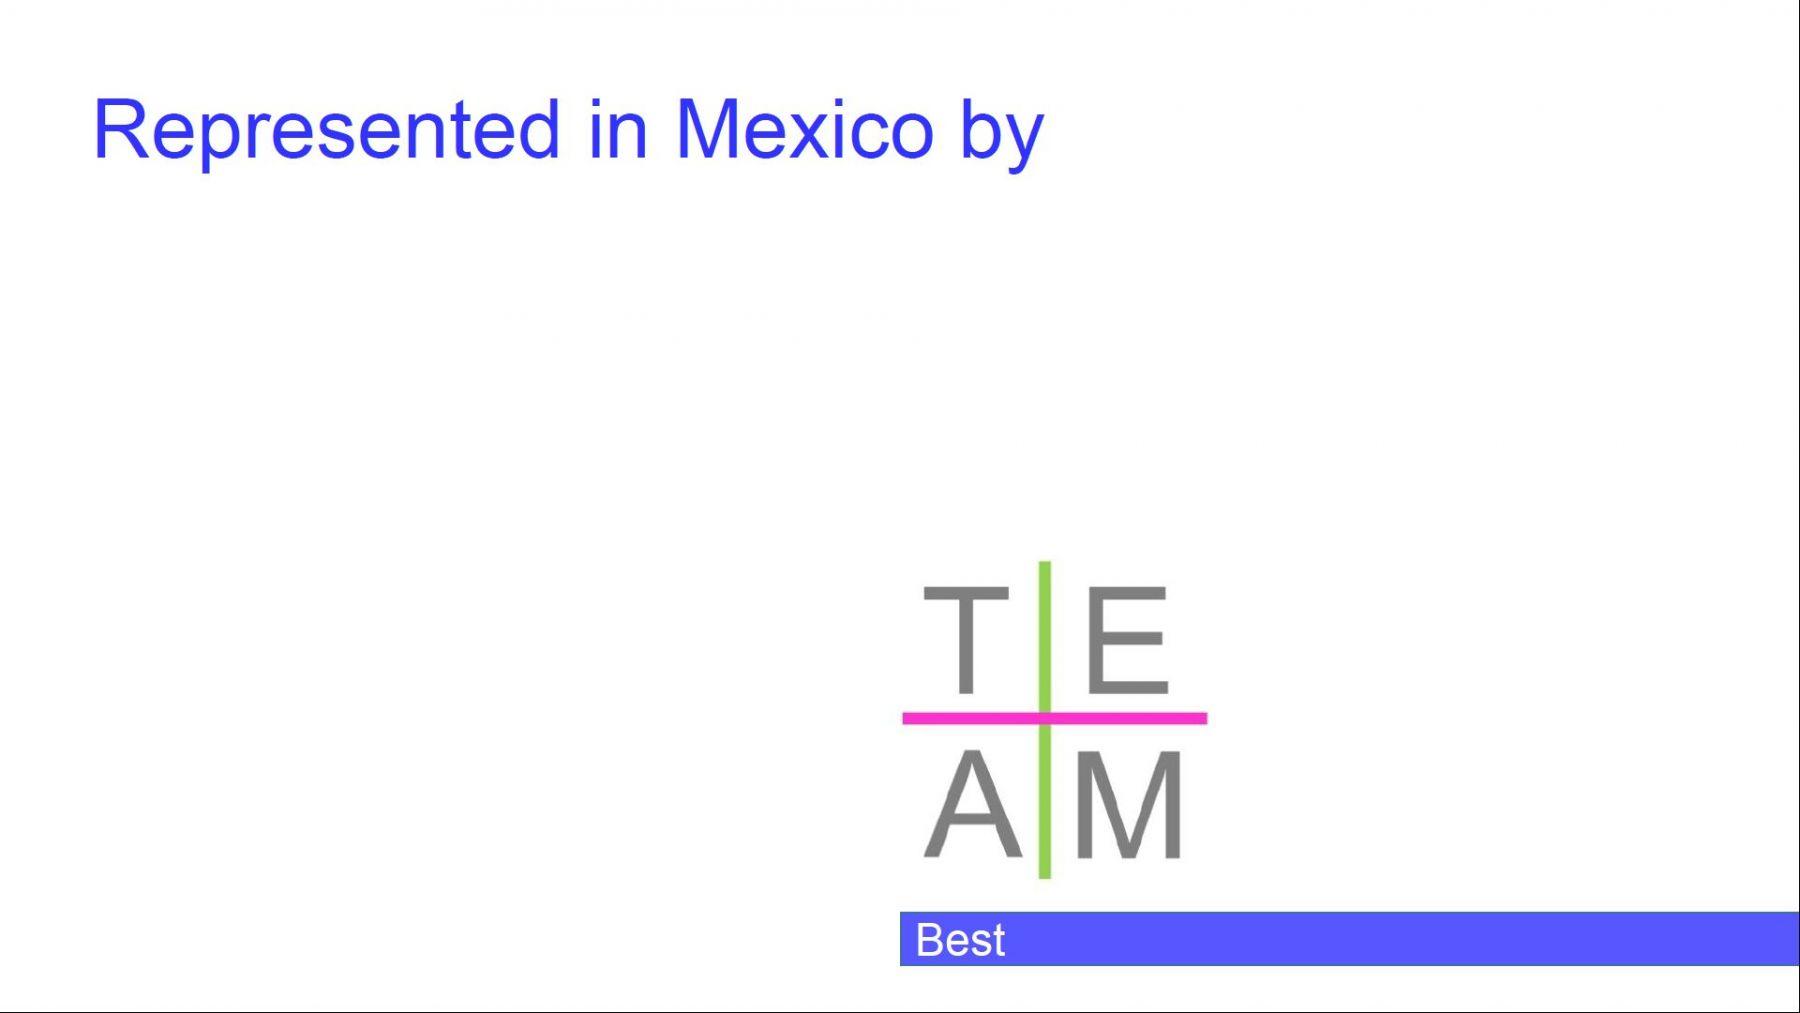 Represented in Mexico